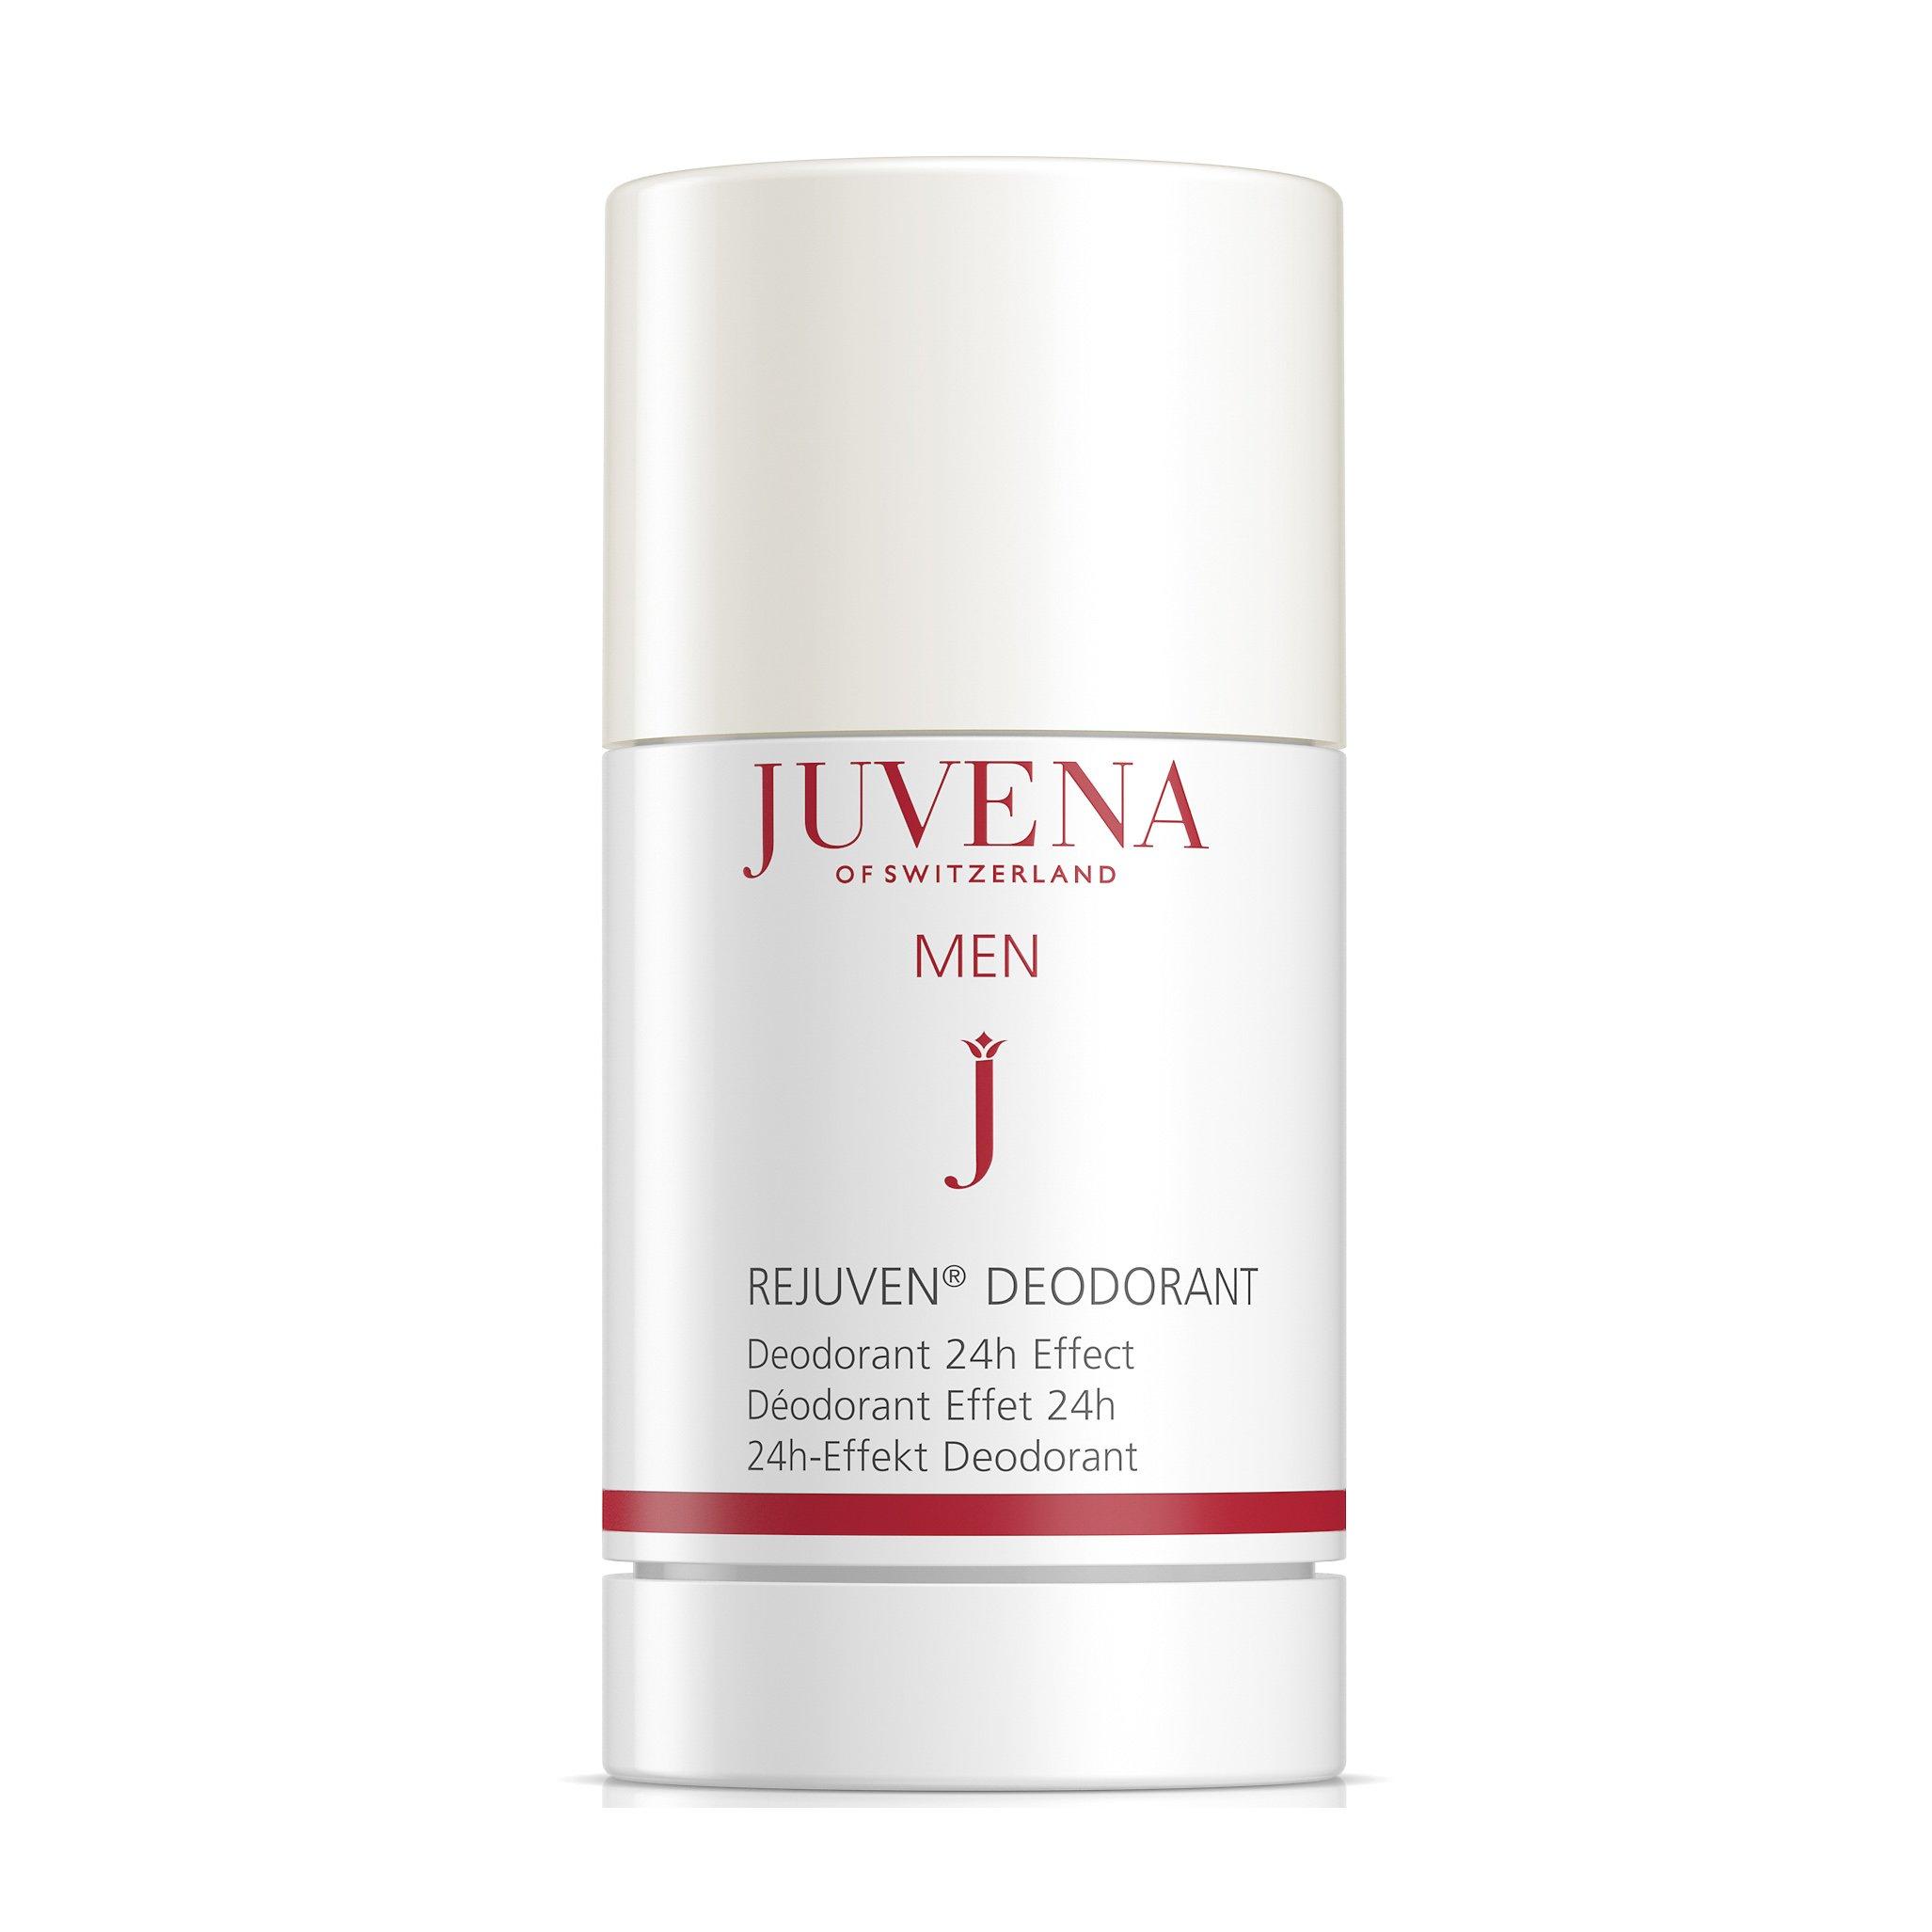 Juvena Men Rejuven Deodorant 24h Effect Αποσμητικό Stick για την Ανδρική Επιδερμίδα Χωρίς Άλατα Αλουμινίου & Οινόπνευμα 75ml